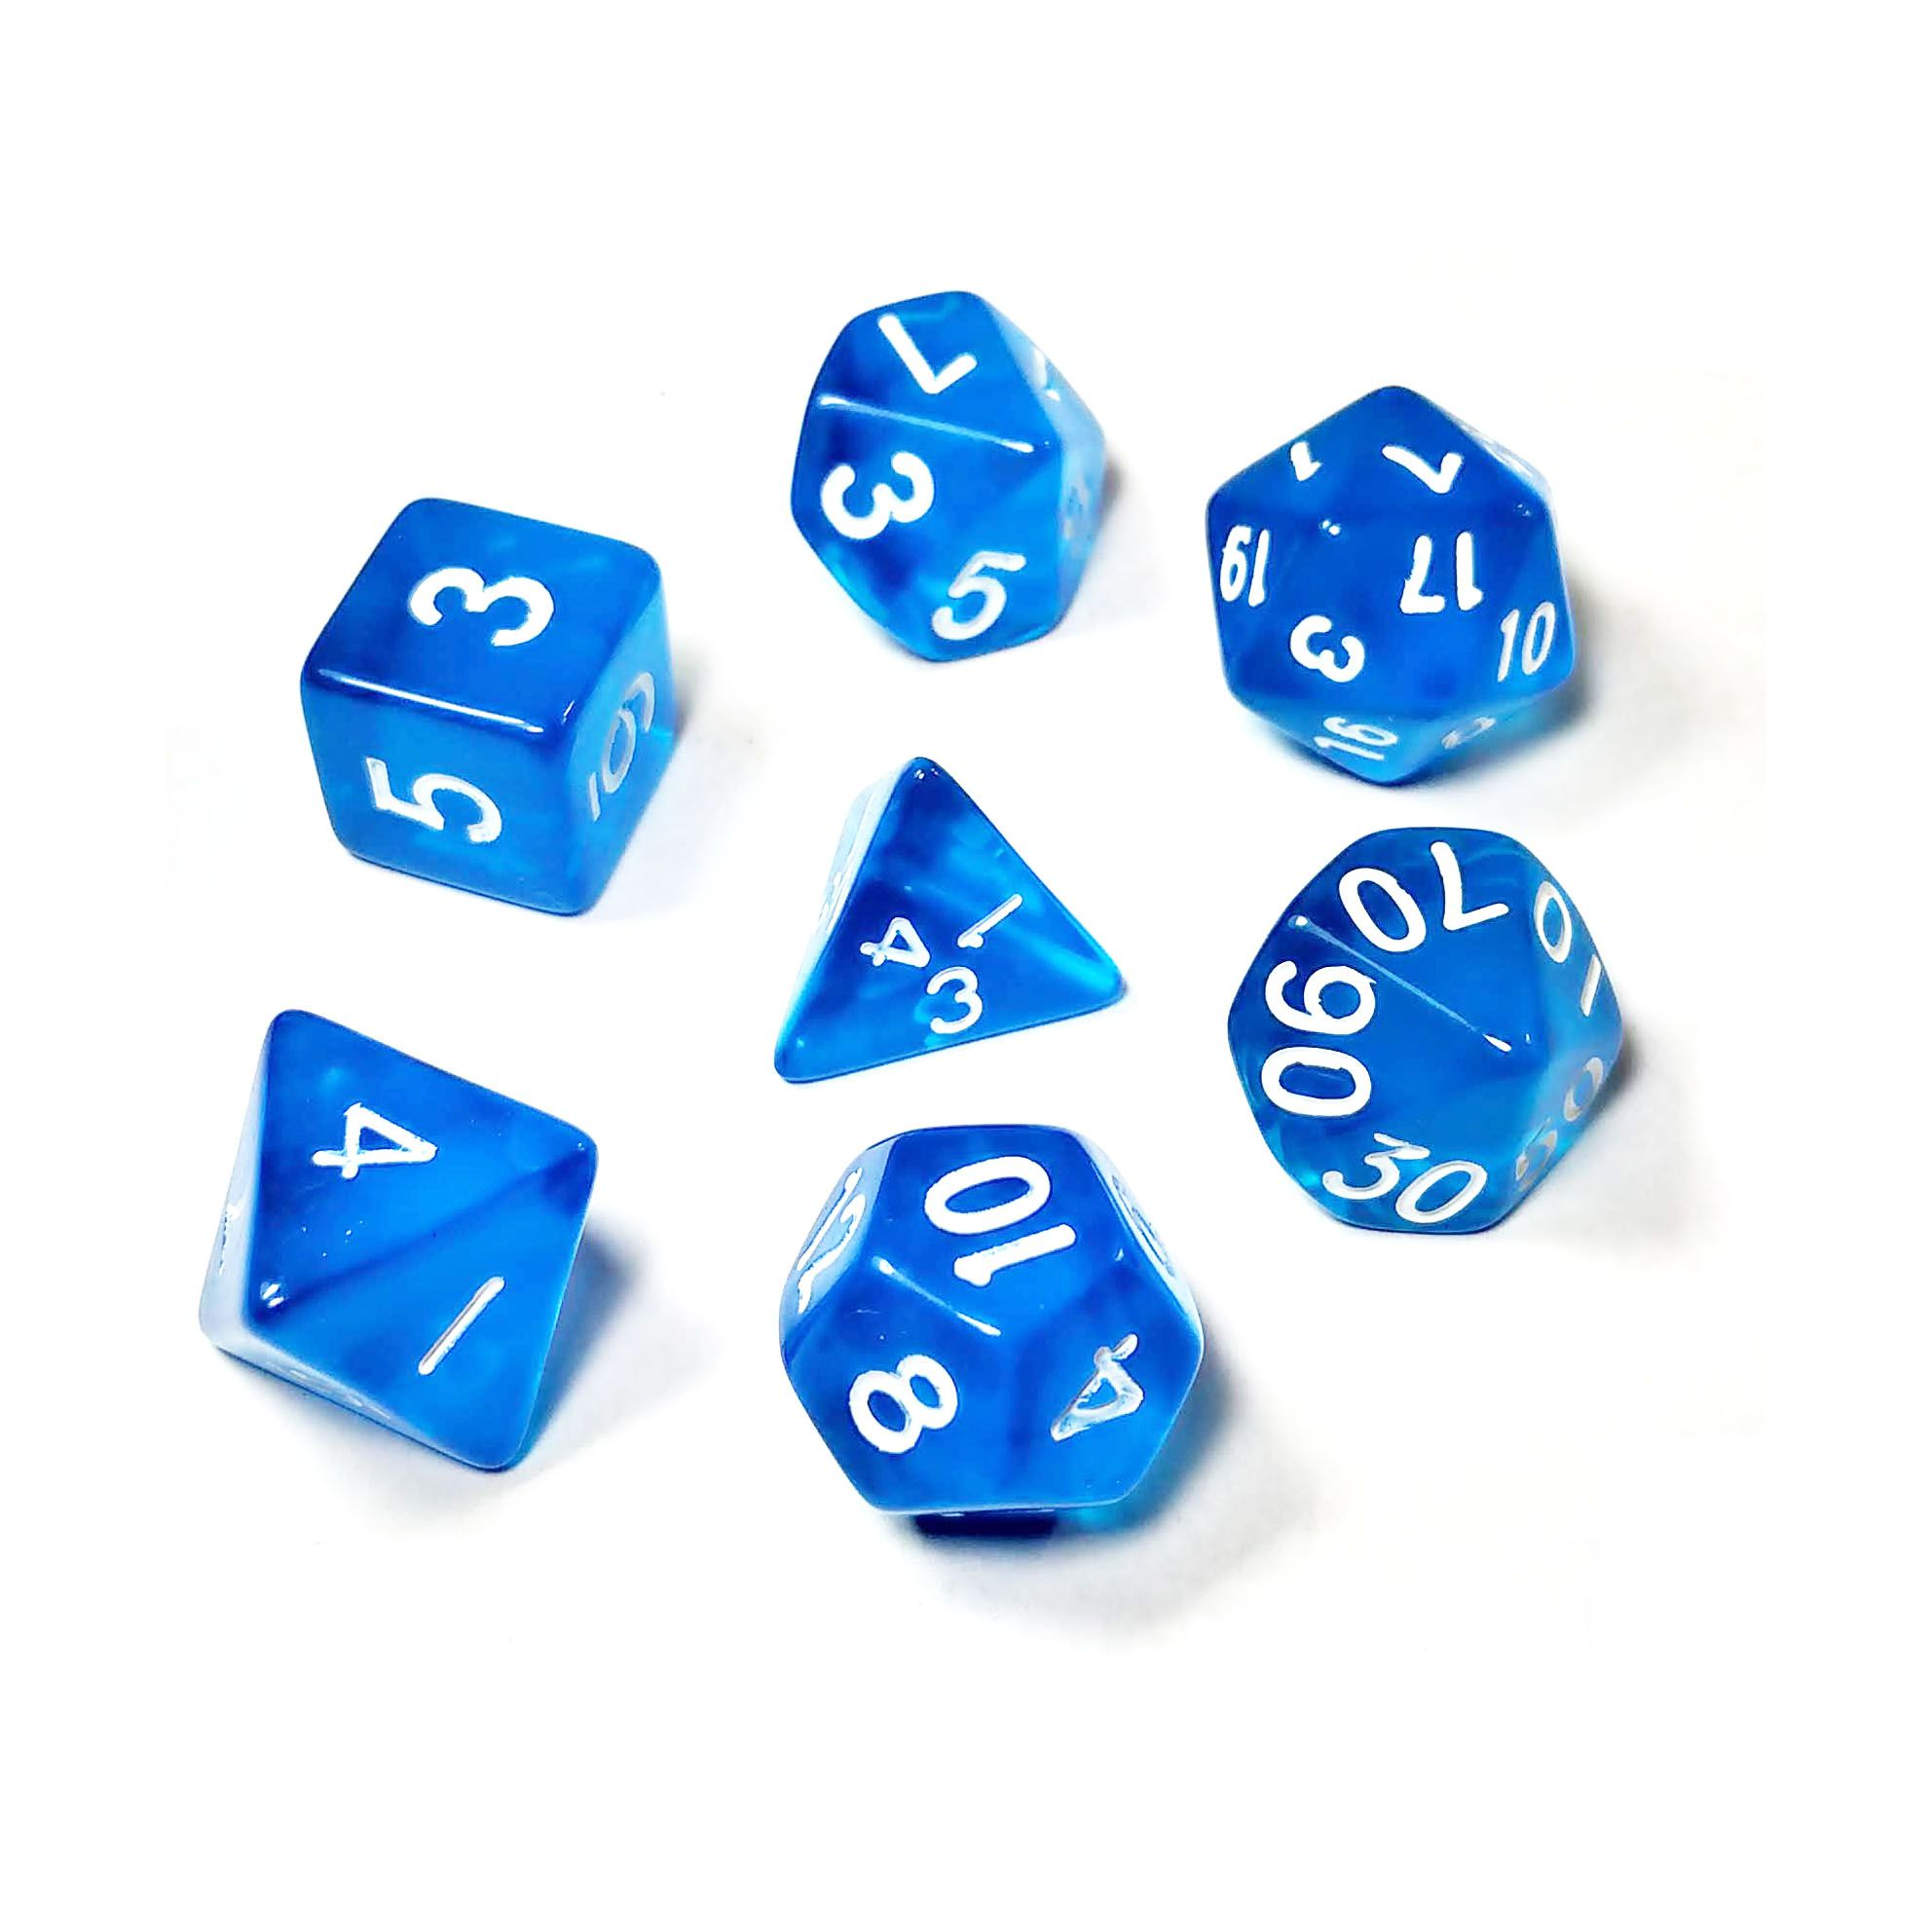 Conjunto de 7 Dados para RPG Translucido Azul (D4, D6, D8, D10, D10%, D12, D20)  - Place Games